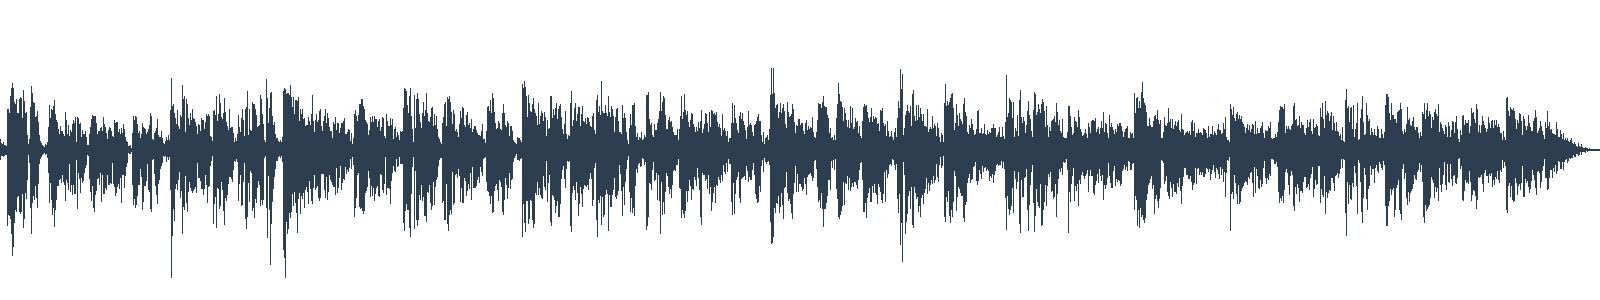 Nové audioknihy 12/2019 waveform